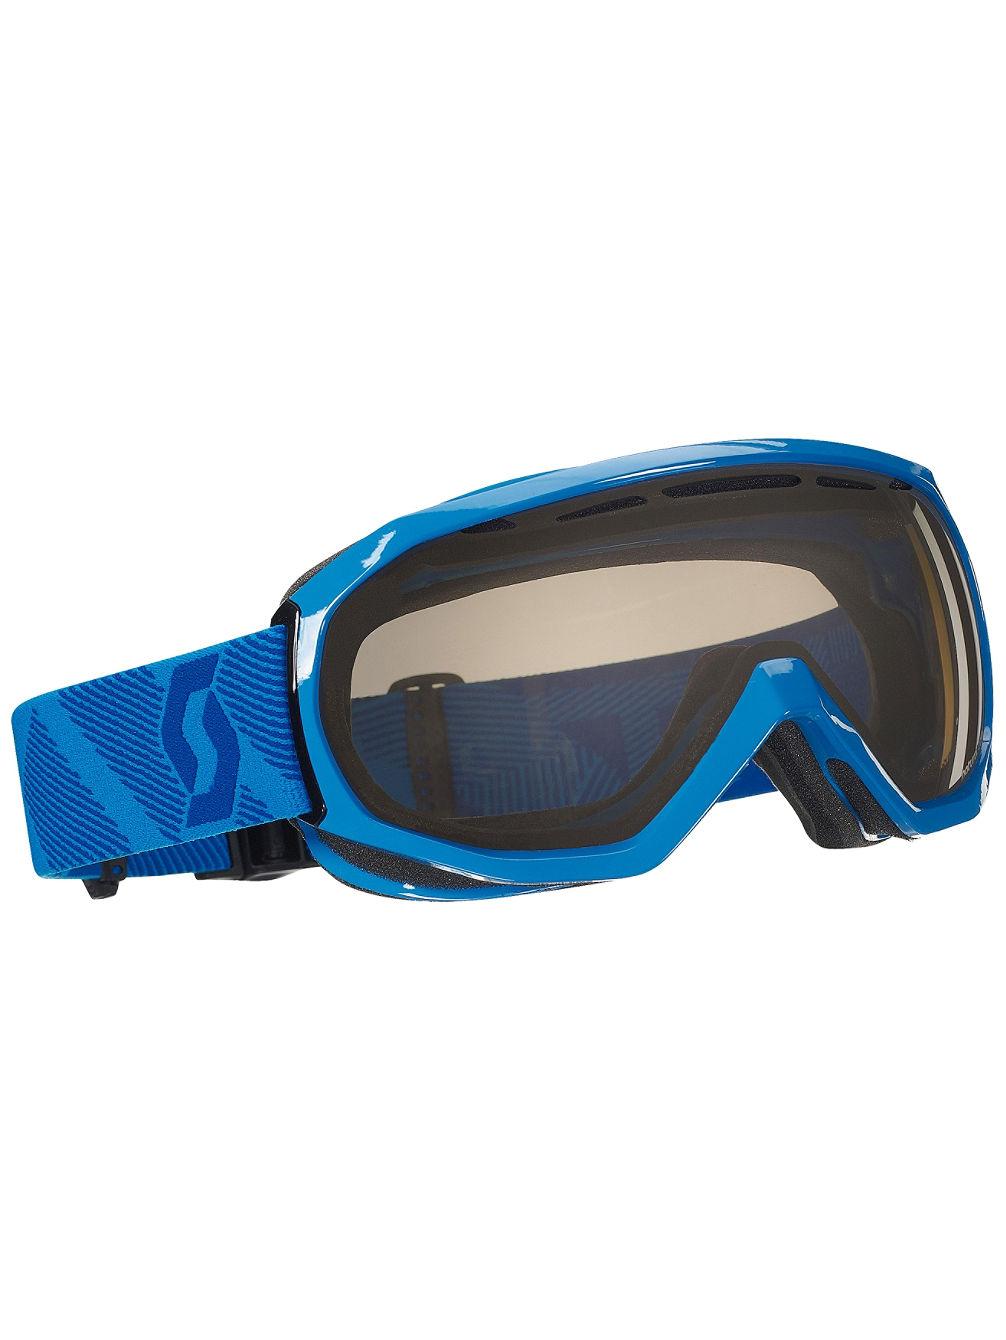 Scott Notice OTG Painted Blue Goggle